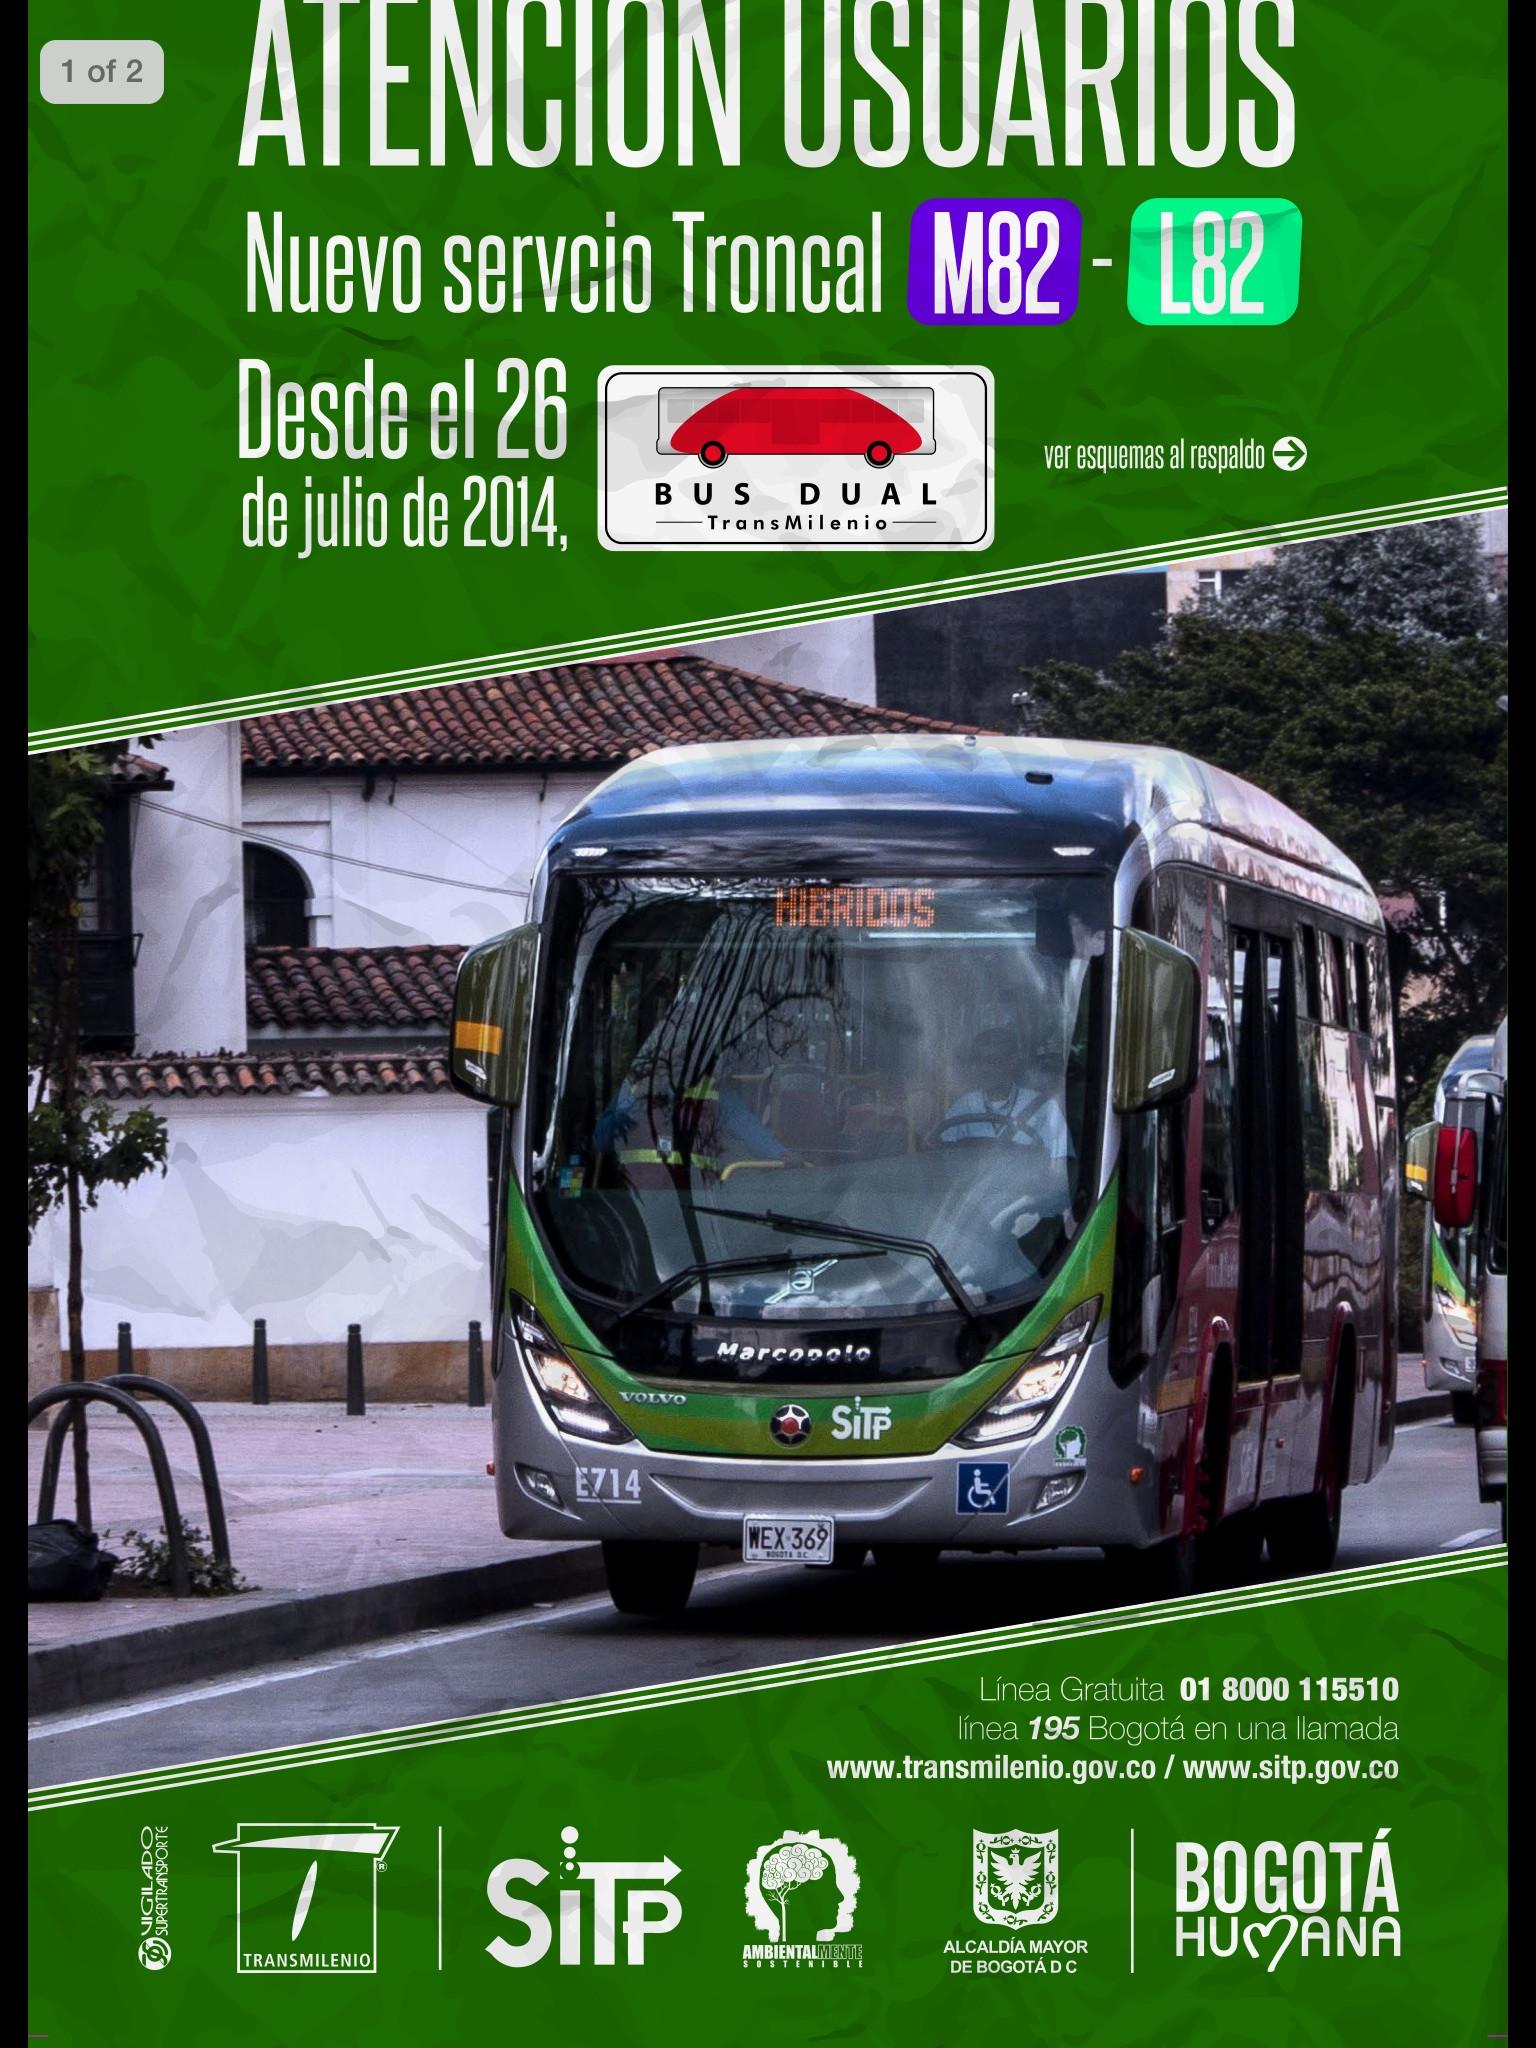 Volante bus DUAL M82-L82